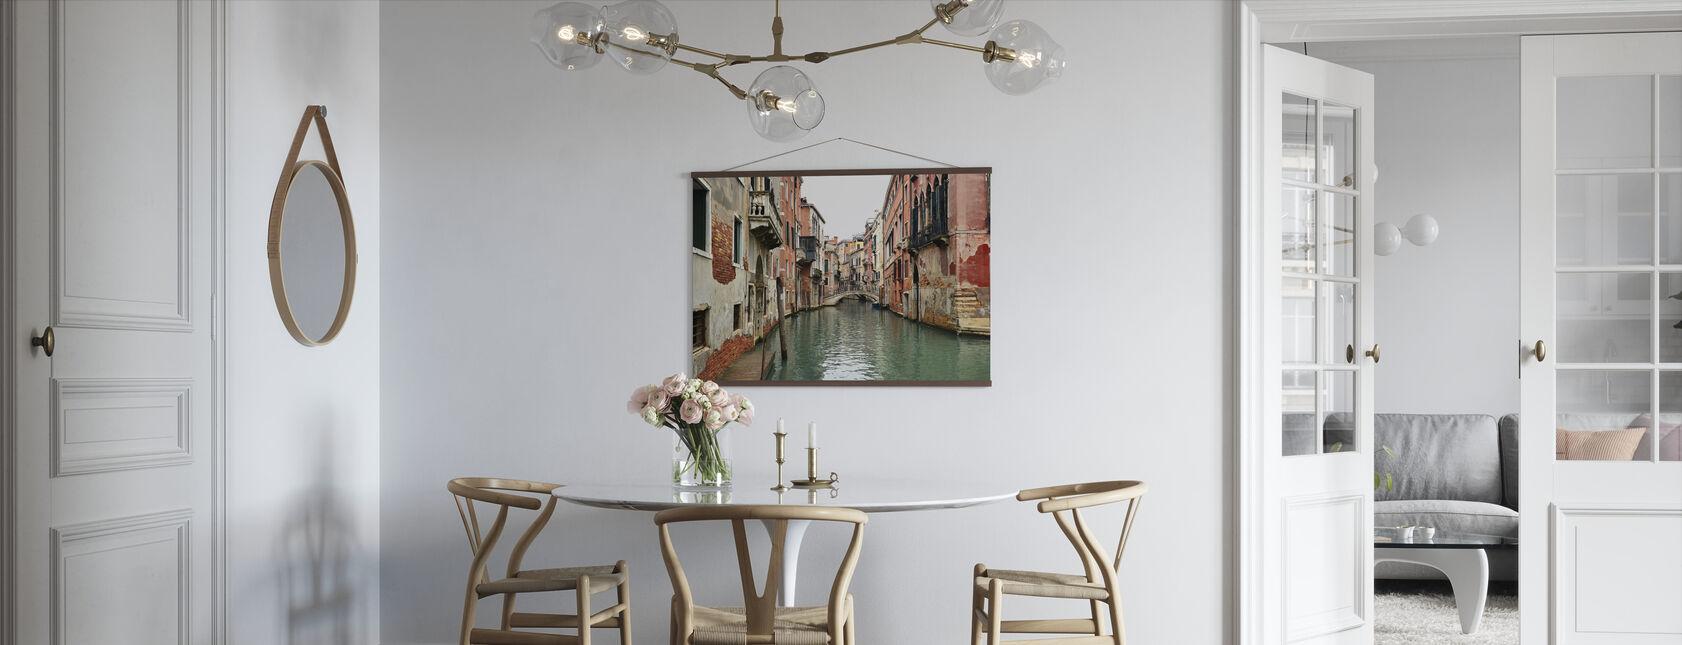 Bakstenen en watersteegjes in Venetië - Poster - Keuken